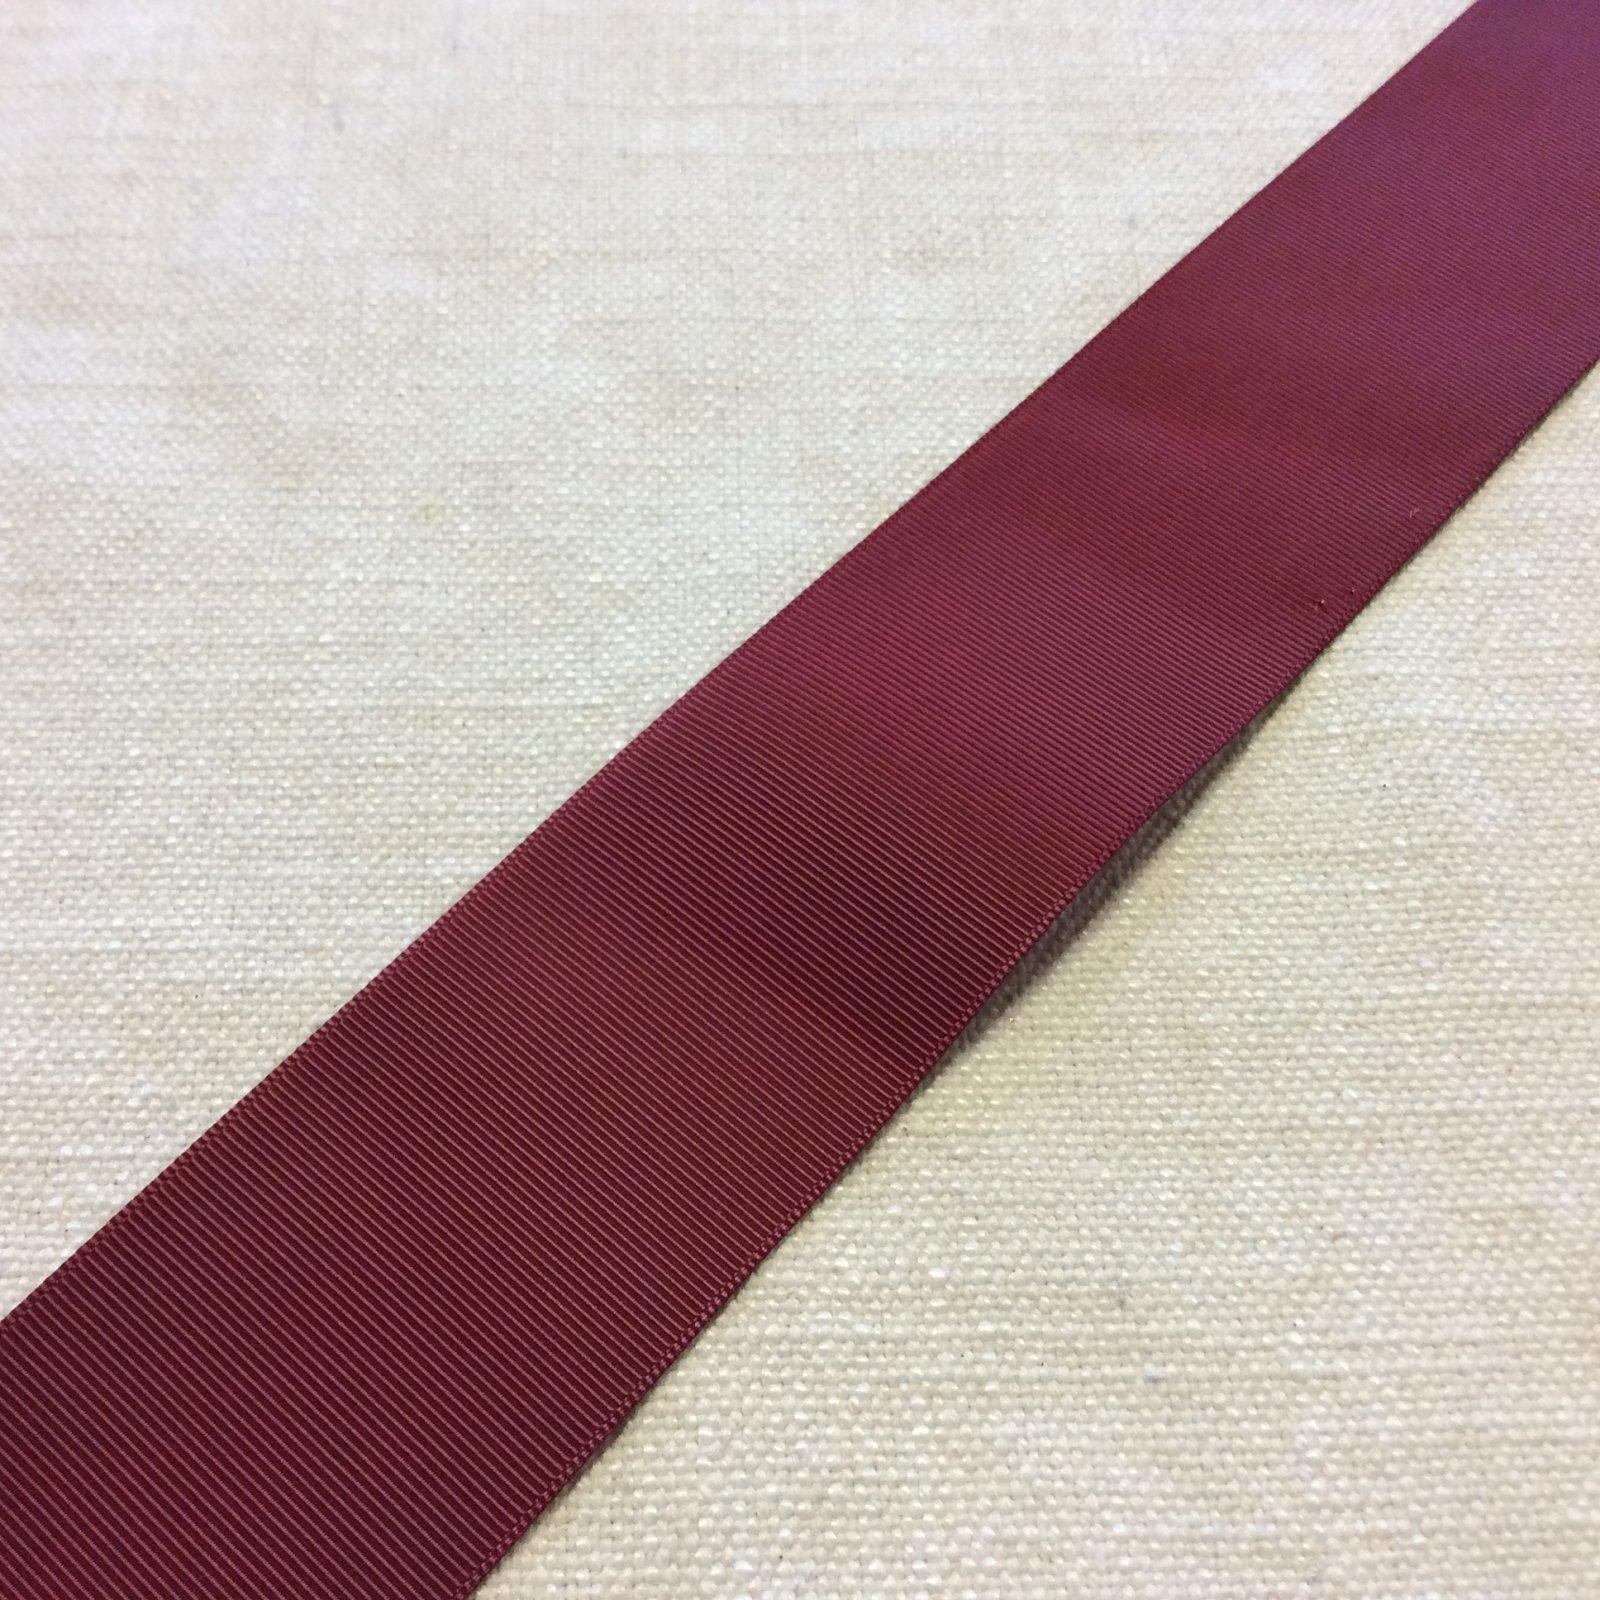 Grosgrain Ribbon 2 Red Trim Ribbon RIB1152